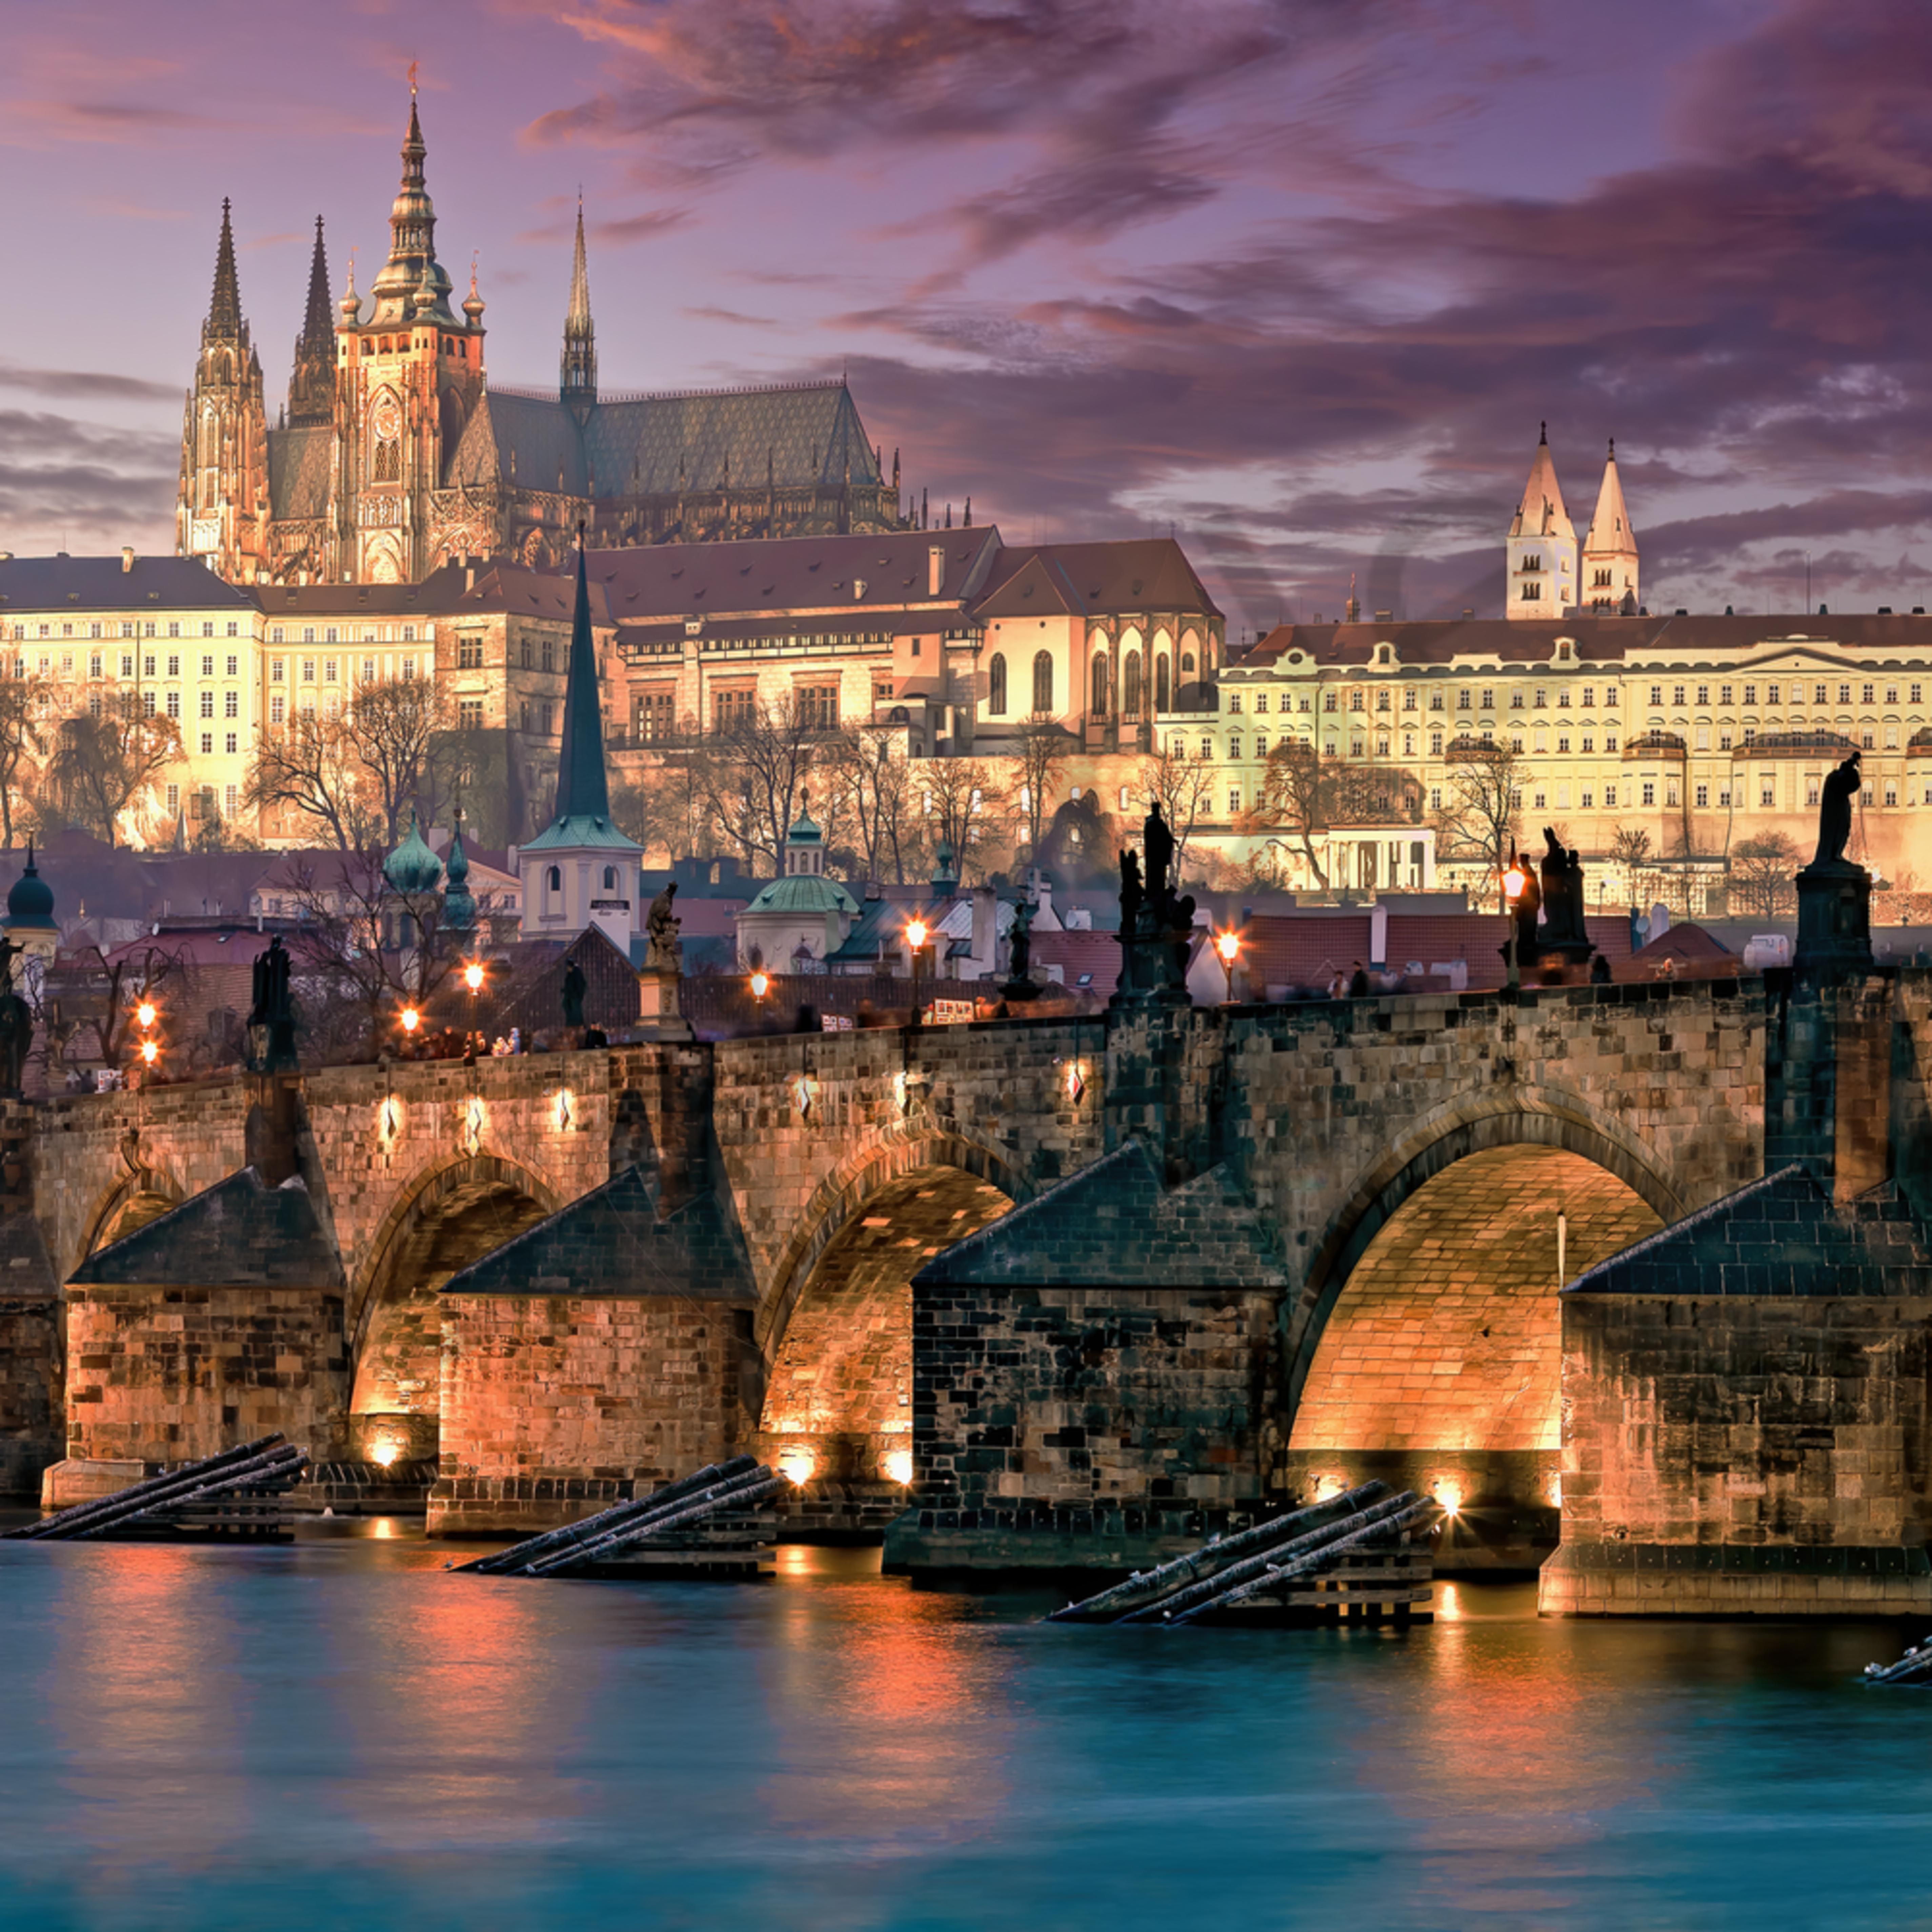 Prague and charles bridge at night xjseoy